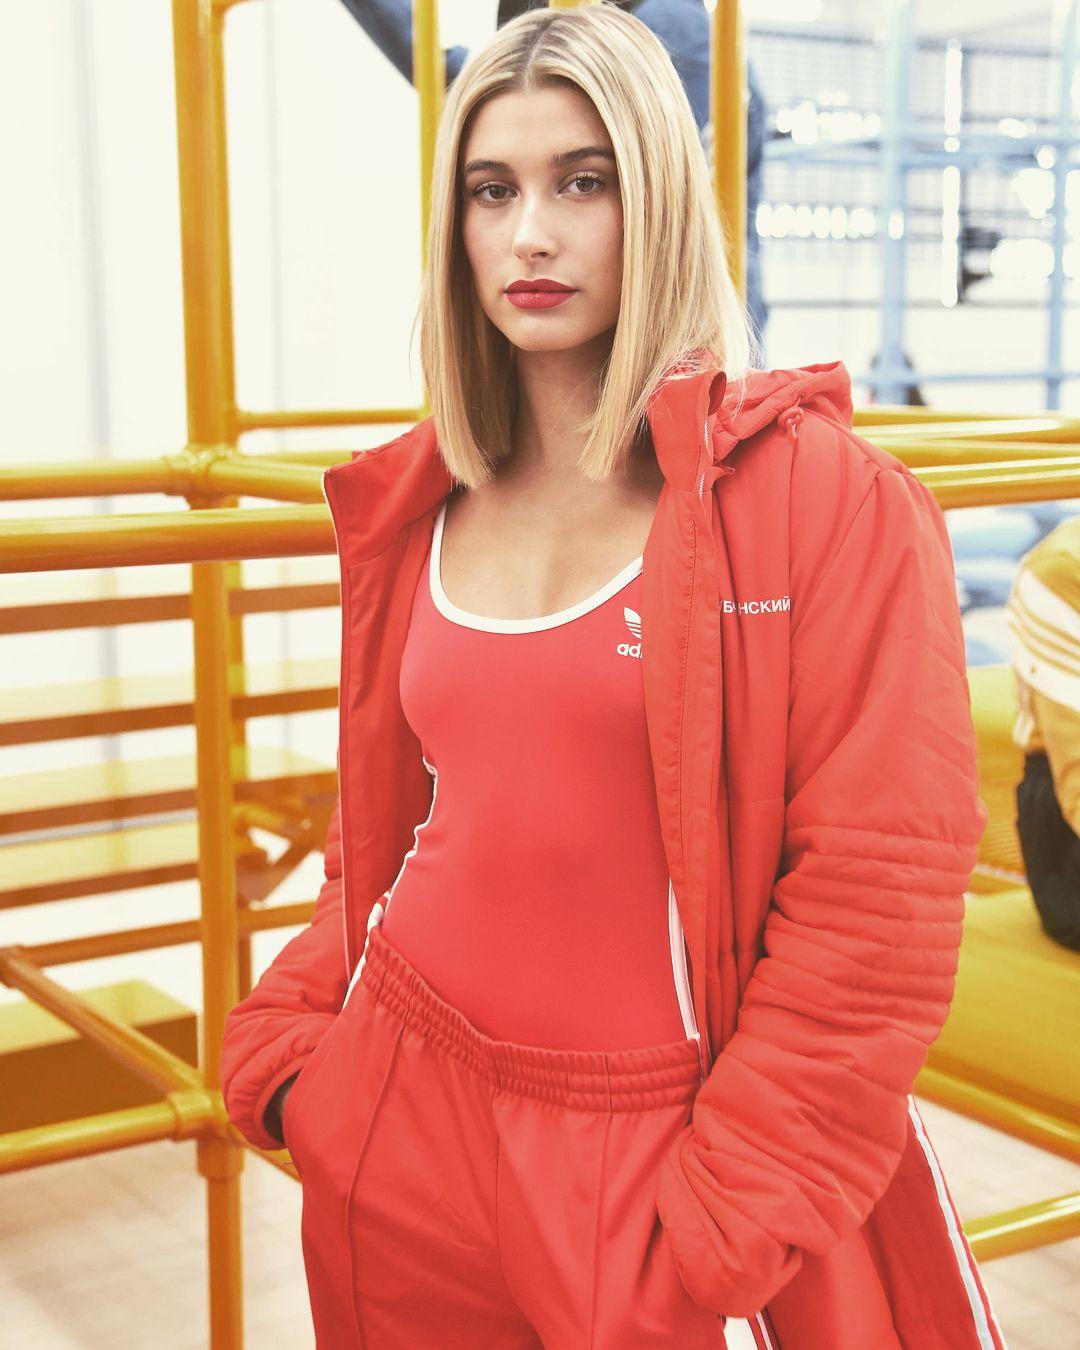 8 febbraio: hailey all'adidas originali da danielle cathari evento